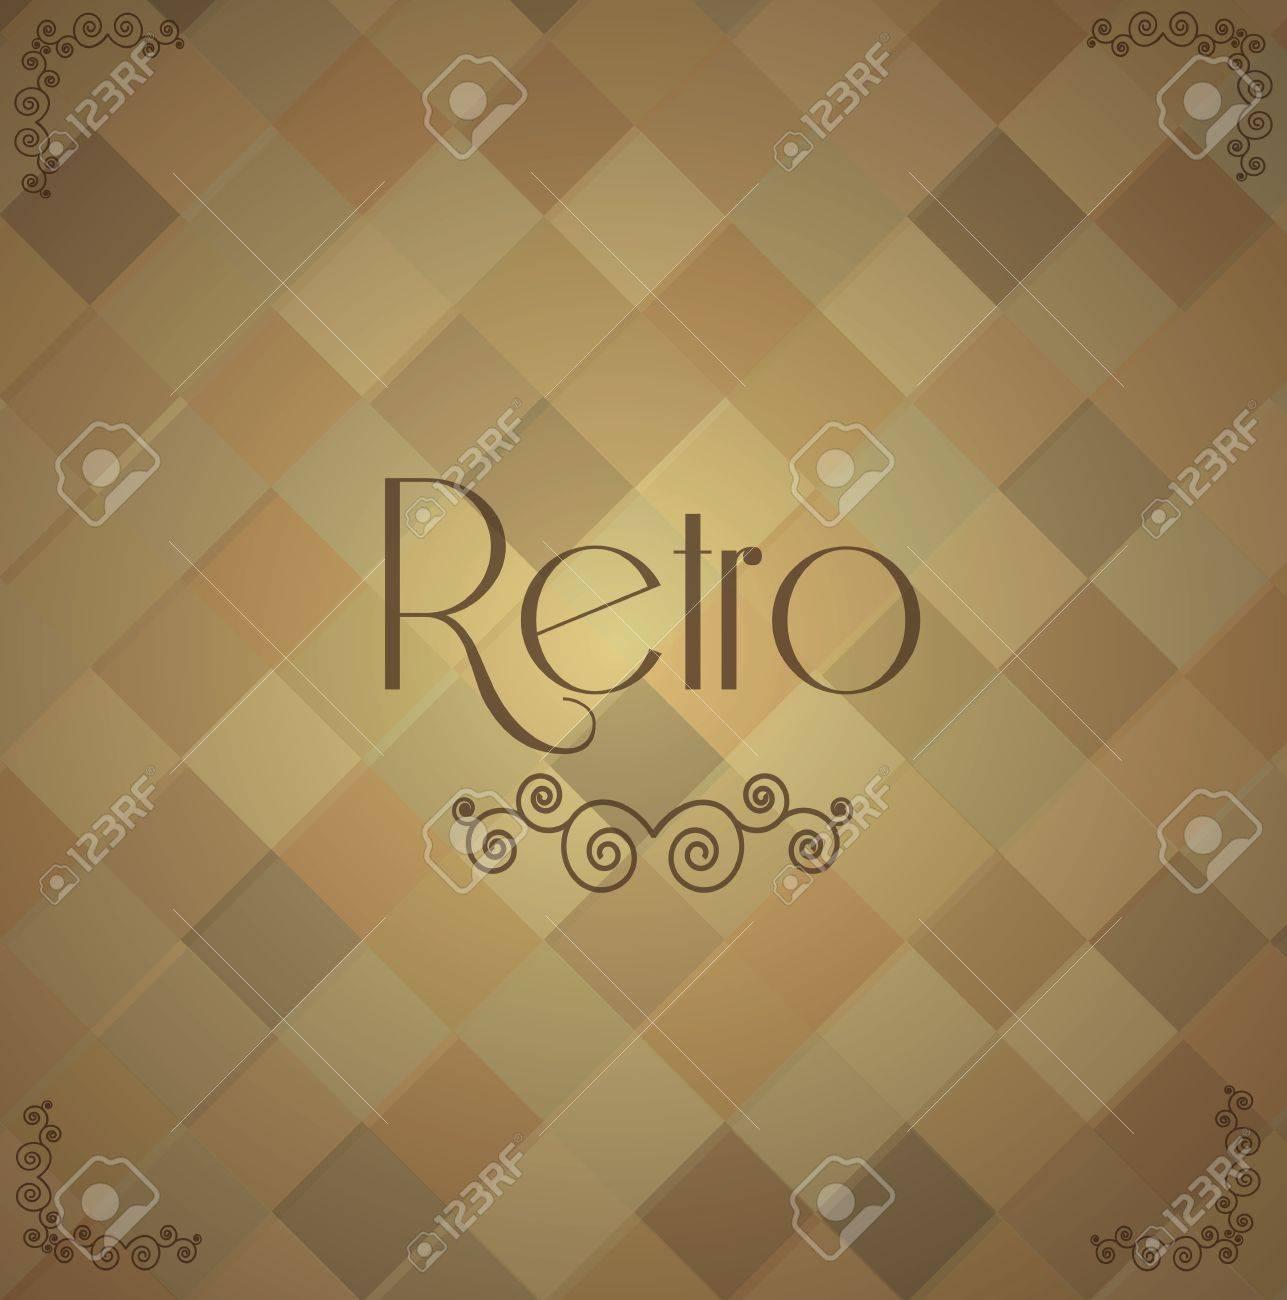 Retro and vintage label over vintage background illustration Stock Vector - 19306138